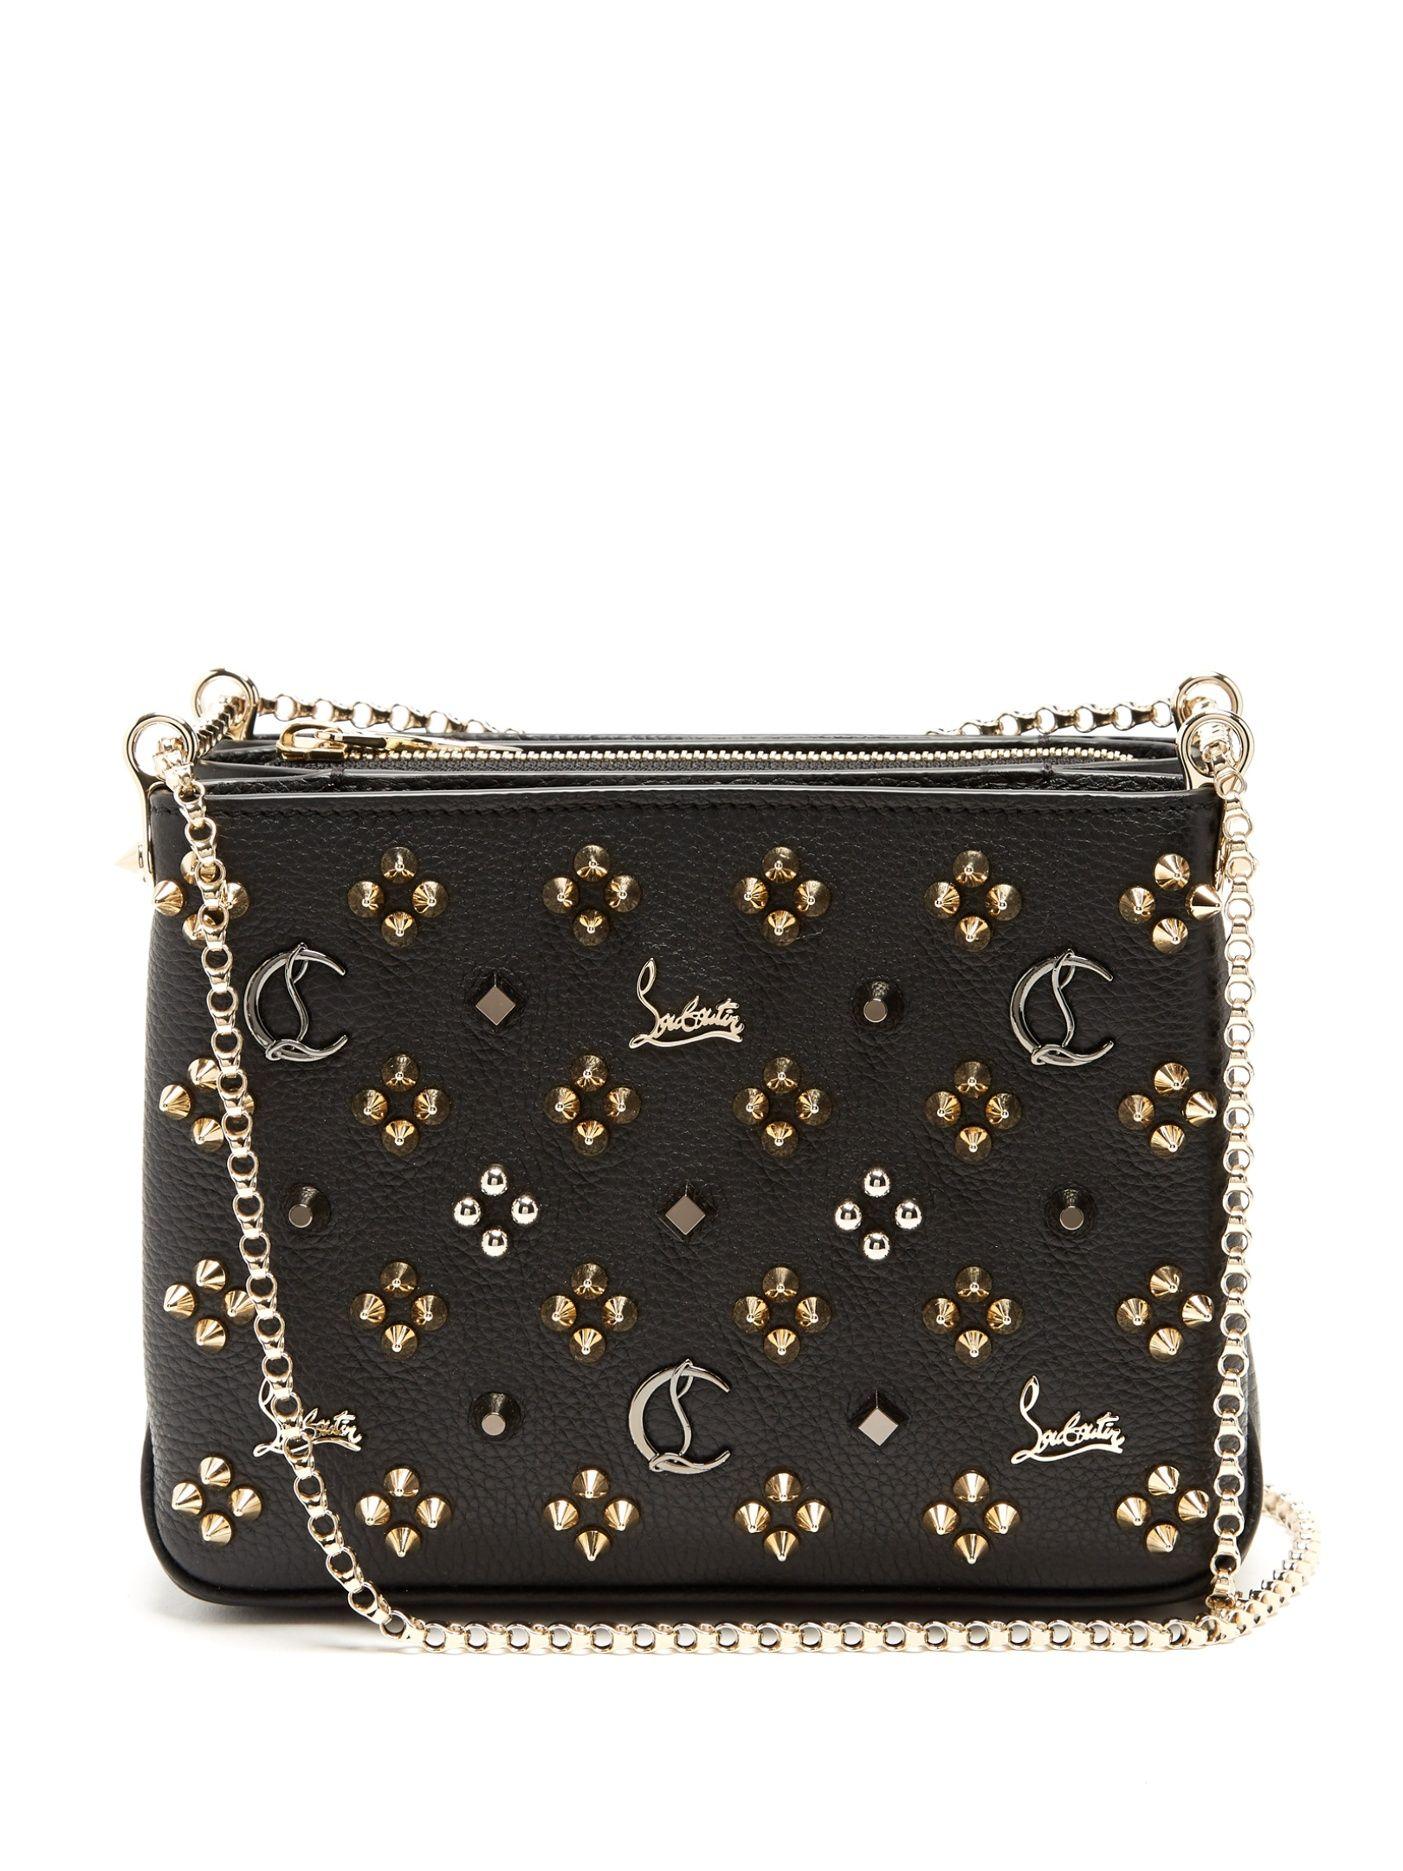 3028041a772 Triloubi small leather cross-body bag | Christian Louboutin ...